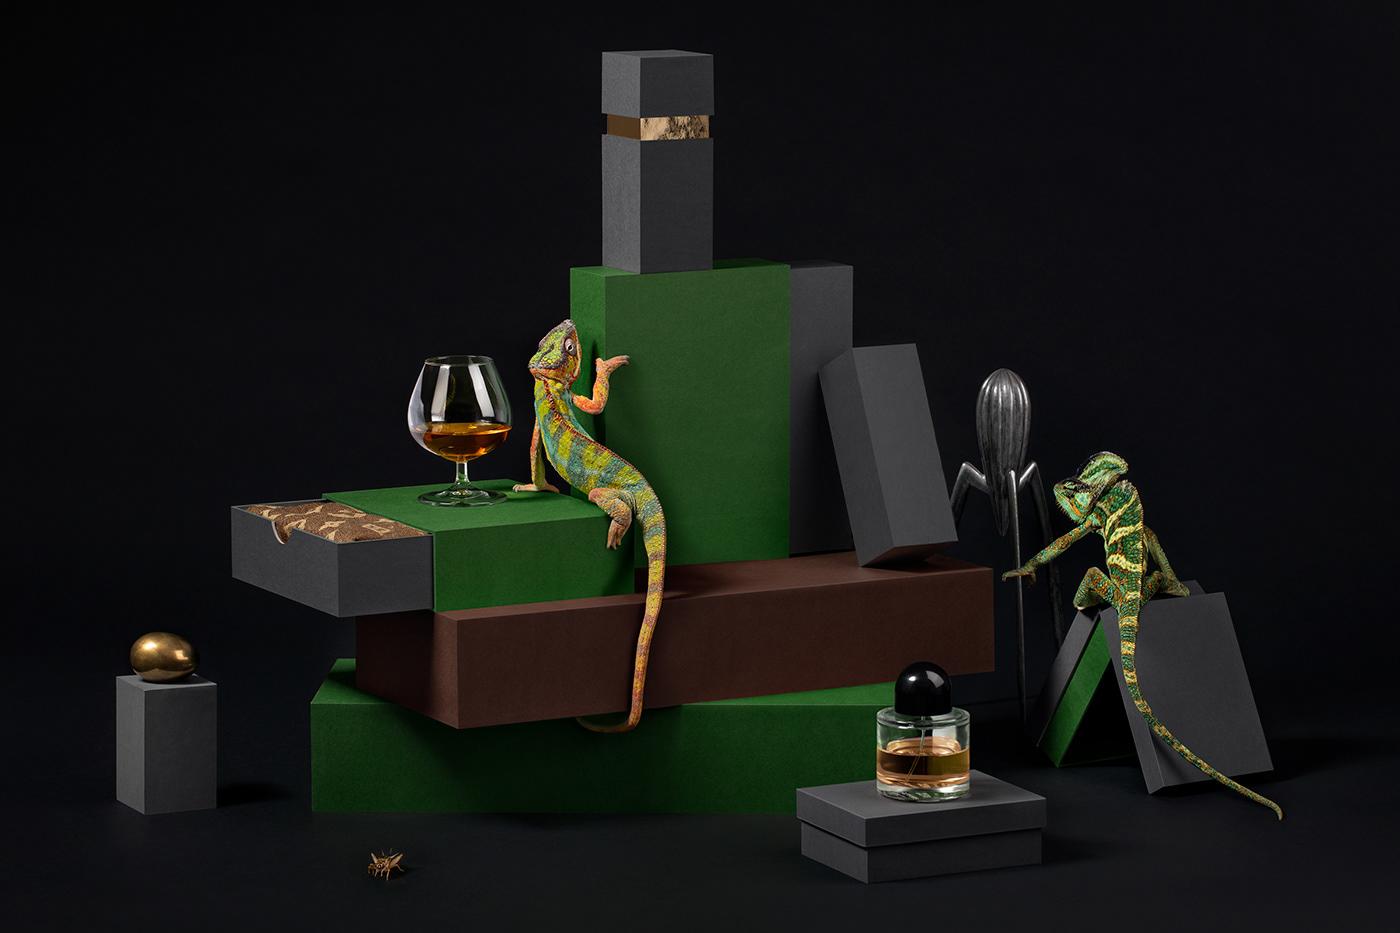 Göteborgstryckeriet - Rigid Boxes Campaign